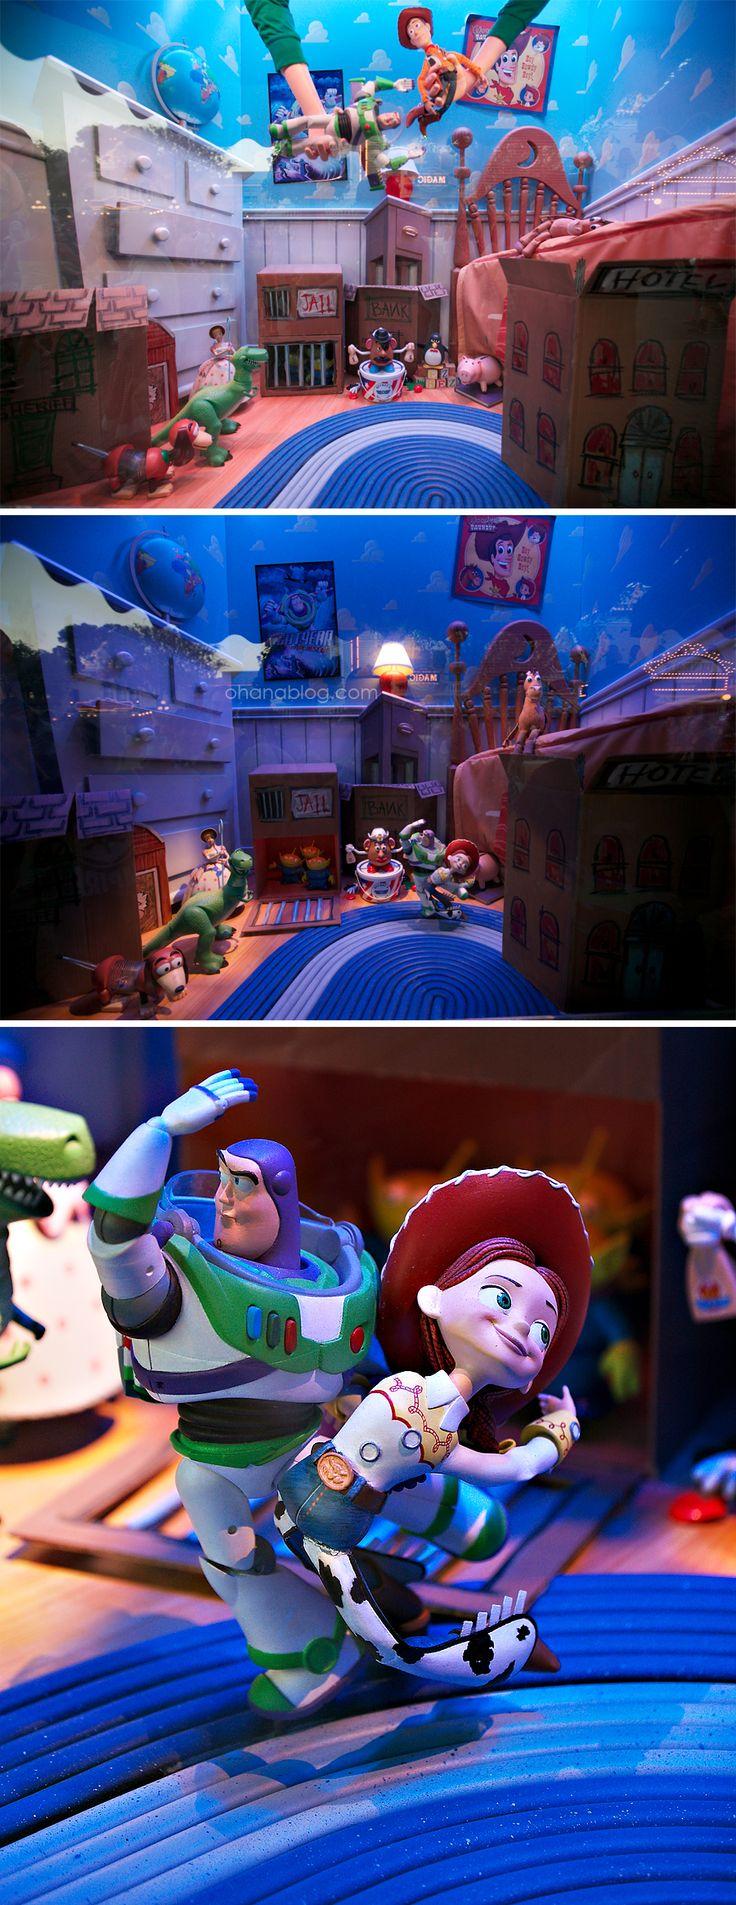 Forced to wear dresses at disneyland stories - Disneyland Toy Story Main Street Window